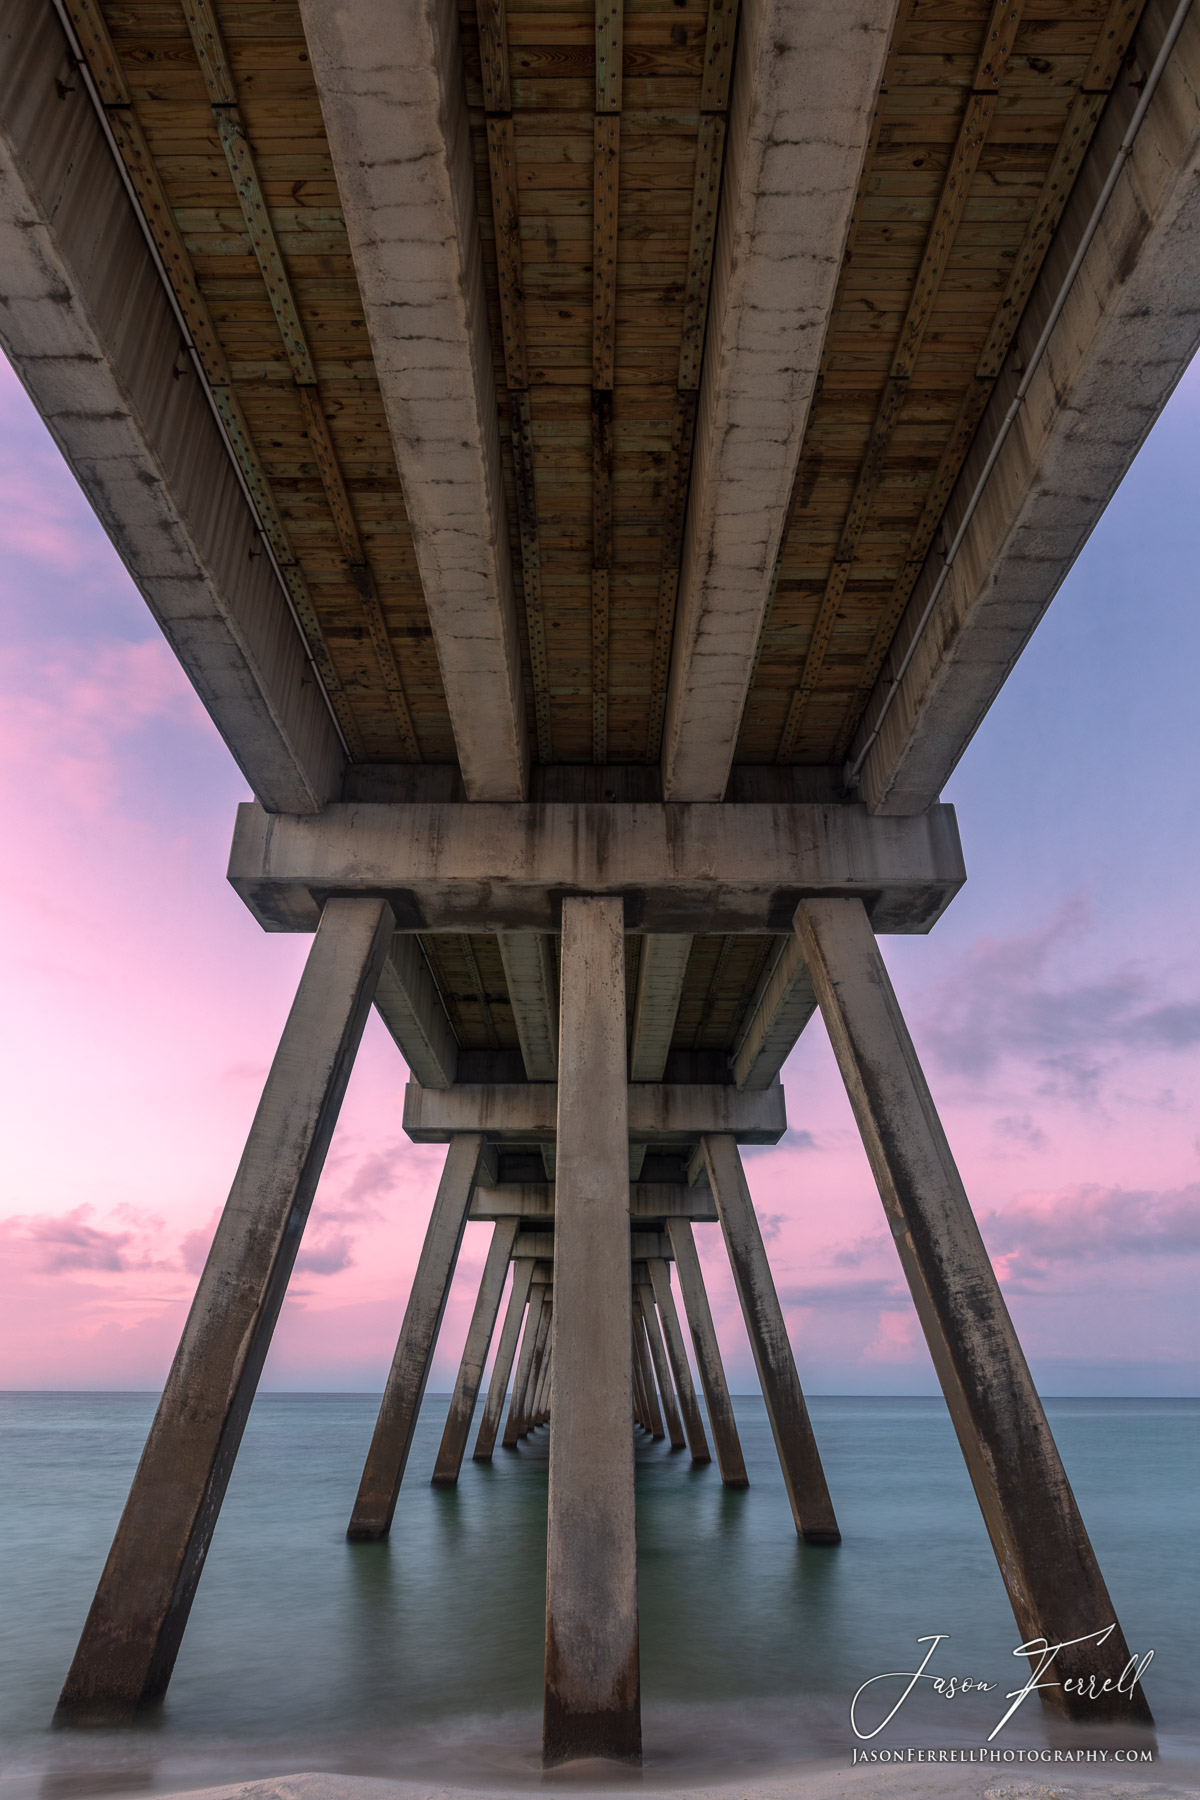 ocean, sea, pier, pillars, sunrise, florida, santa rosa island, sentinel, photo